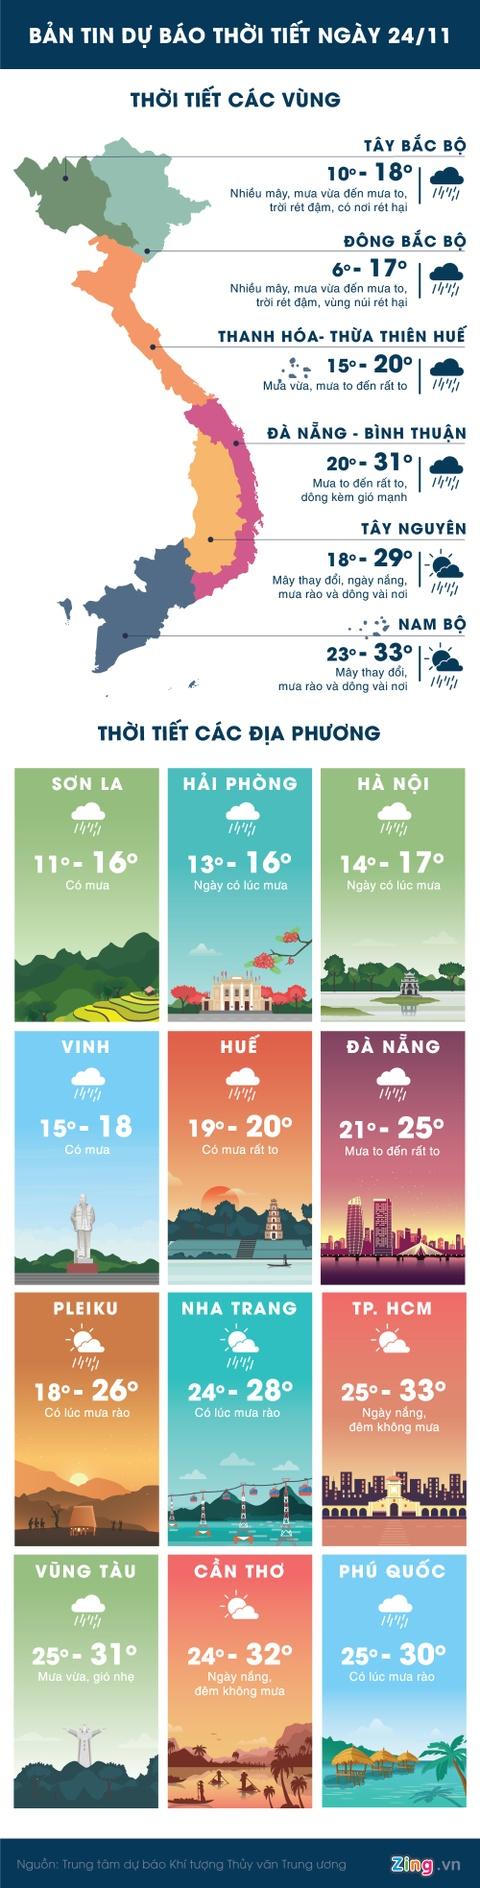 Nguoi Ha Noi co ro suoi am sau mot nam 'vang mua dong' hinh anh 17